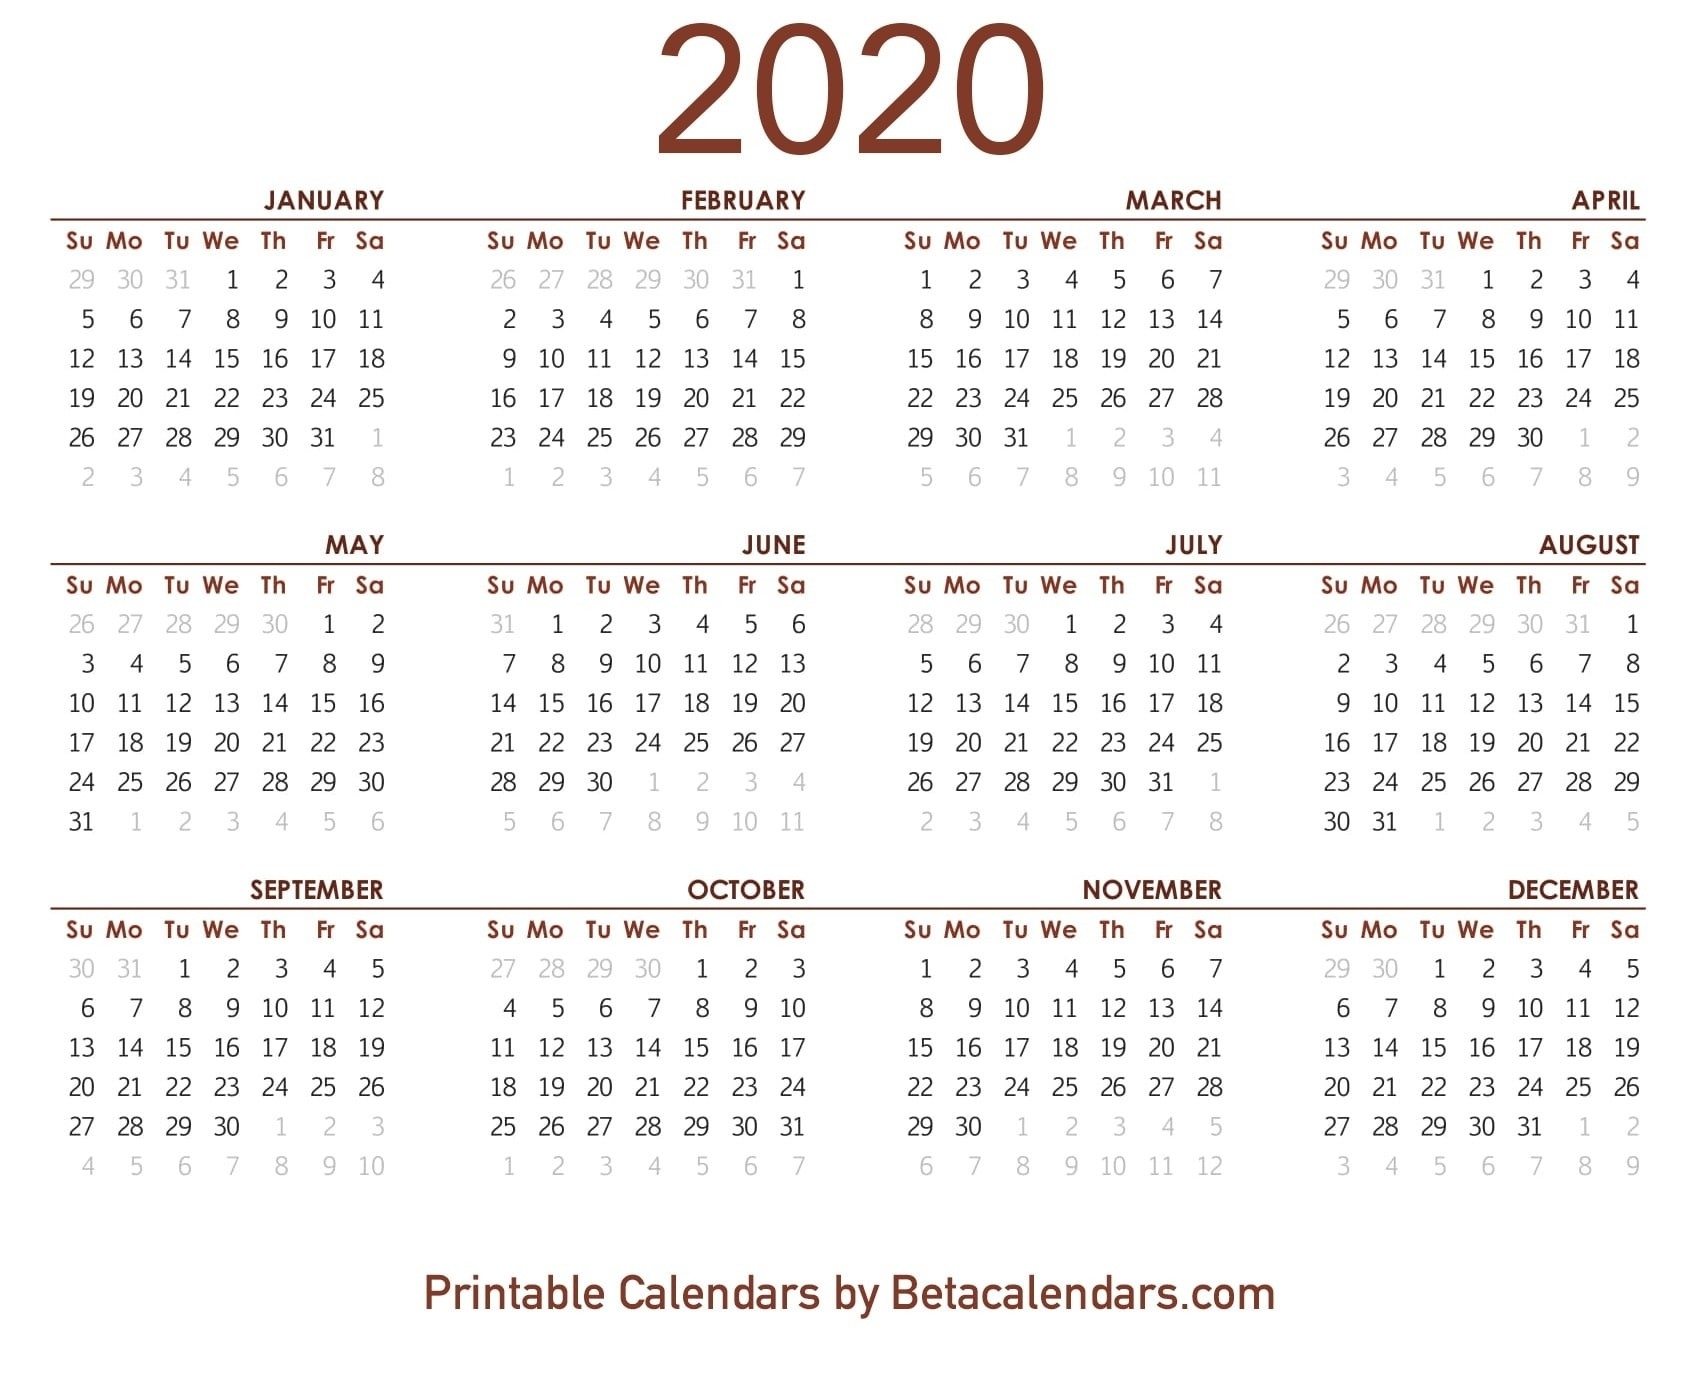 Printable 2020 Lunar Calendar | Monthly Printable Calender  Solar Lunar Calendar 2020